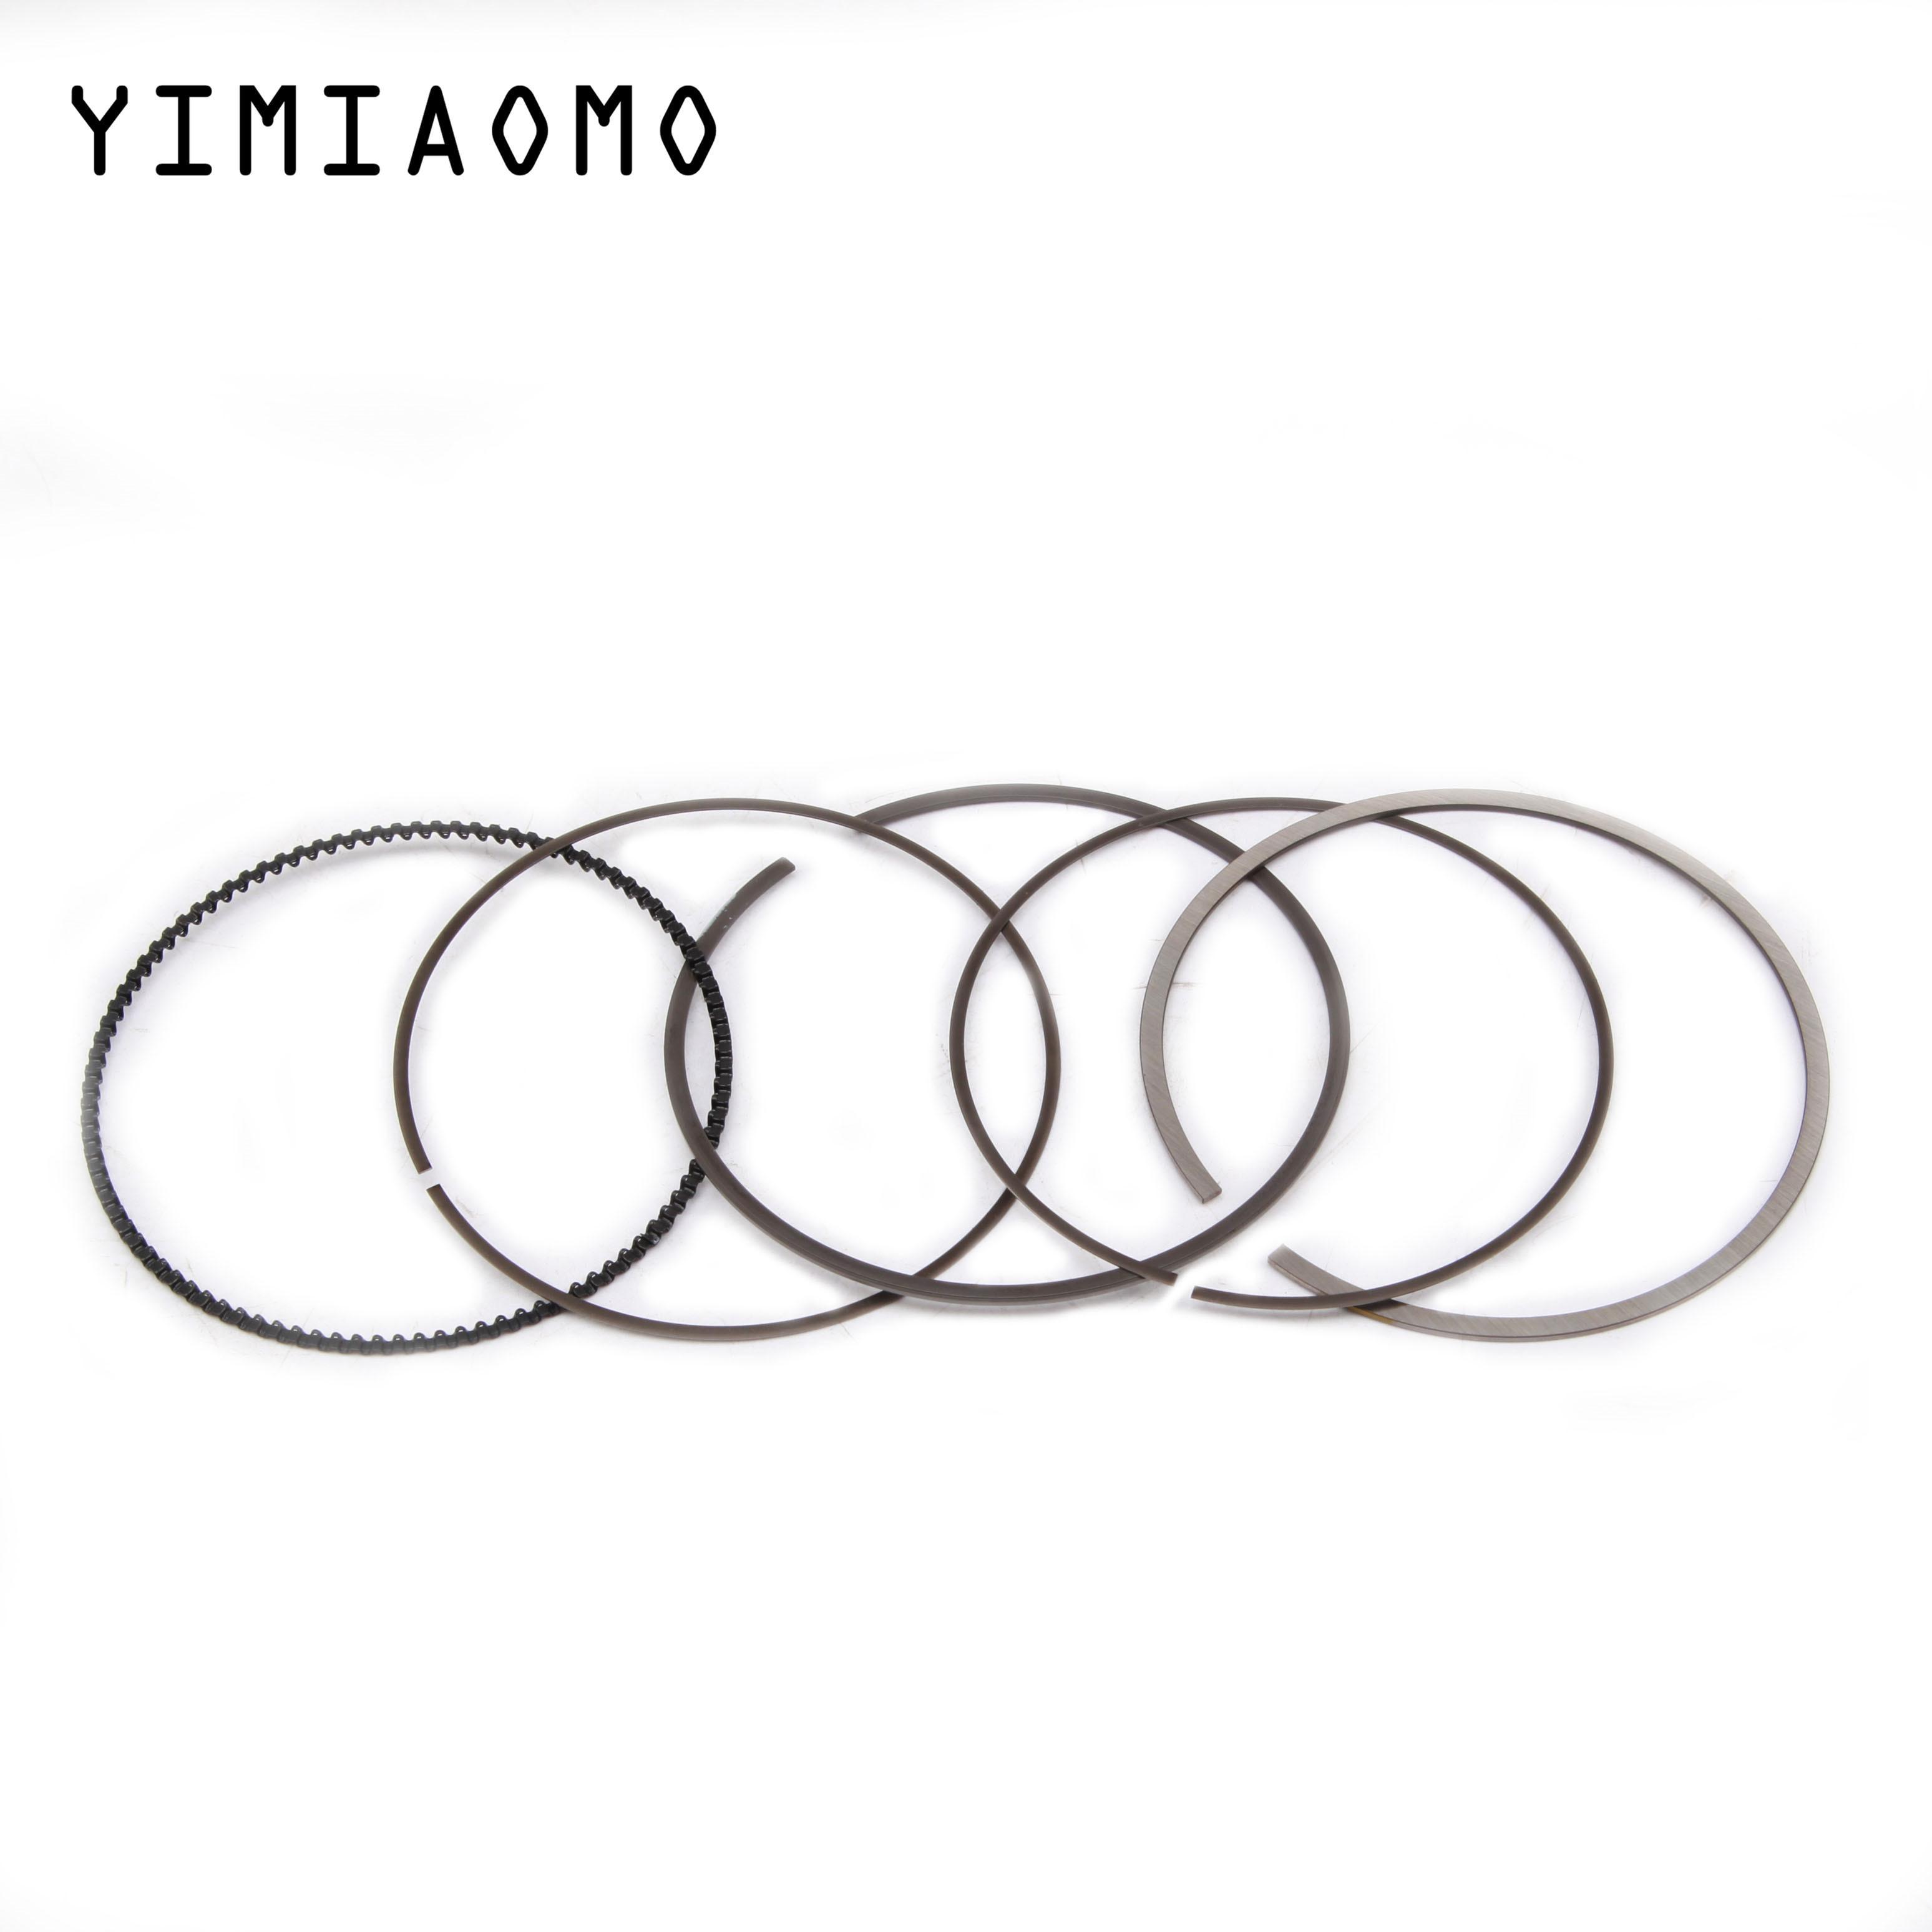 Купить с кэшбэком 270 030 11 17 Engine Pistons Rings Set KS STD Pin 20mm For Mercedes-Benz W176 A250 X156 C117 W246 CLA250 GLA250 A2700301917